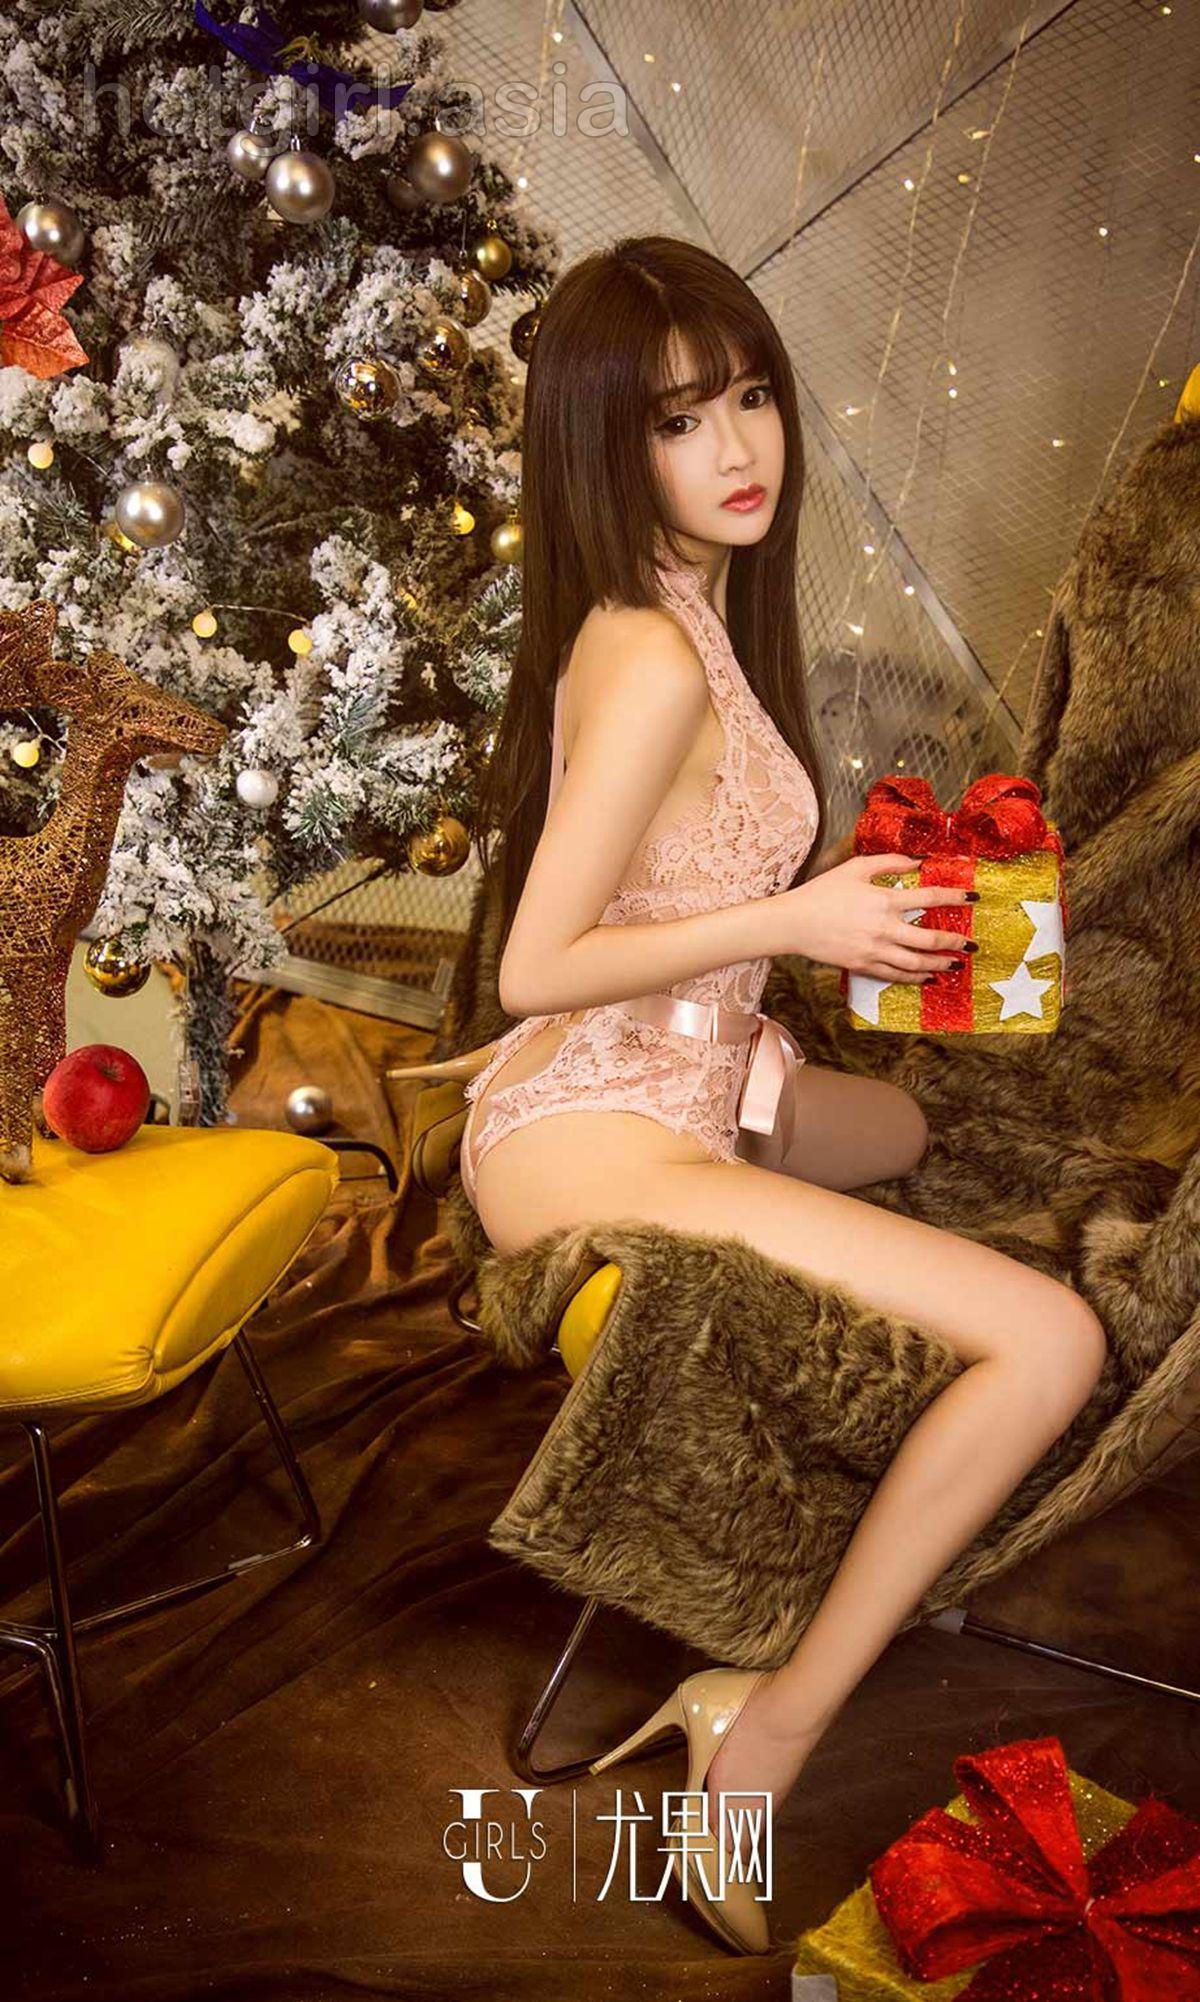 [Ugirls 爱 尤物] No.949 Bunny & Tina-Sleepless Christmas Eve Photo Album